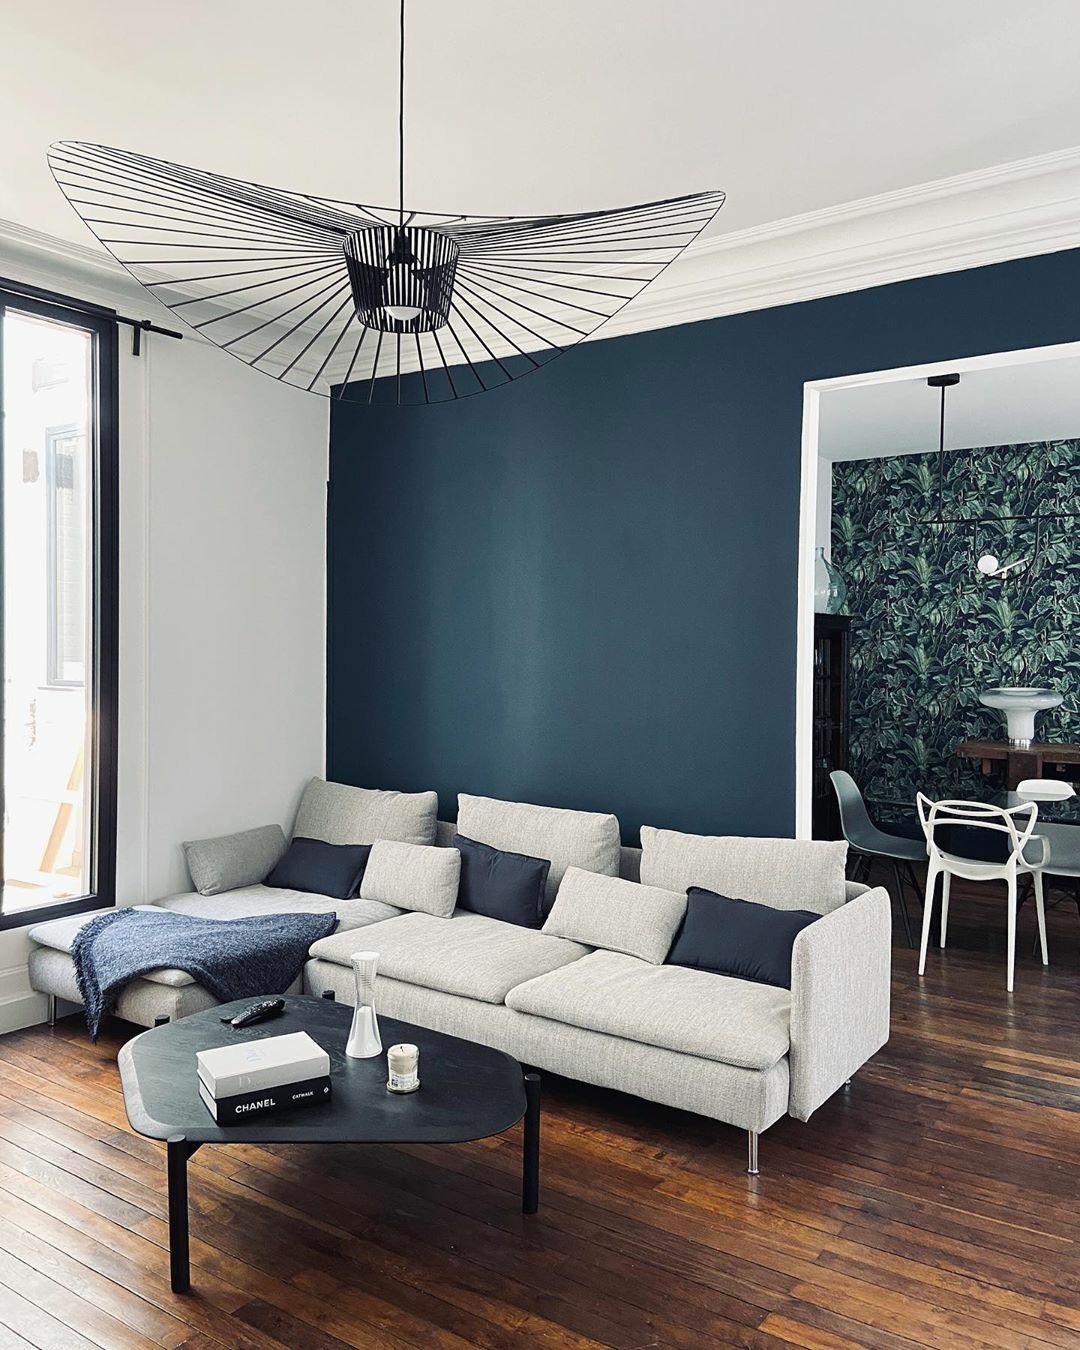 Parisian Design Straw Hat Pendant Lights Black Coffe E27 Luminaire Suspension for Living Room Kitchen Island Bedroom Home Decor